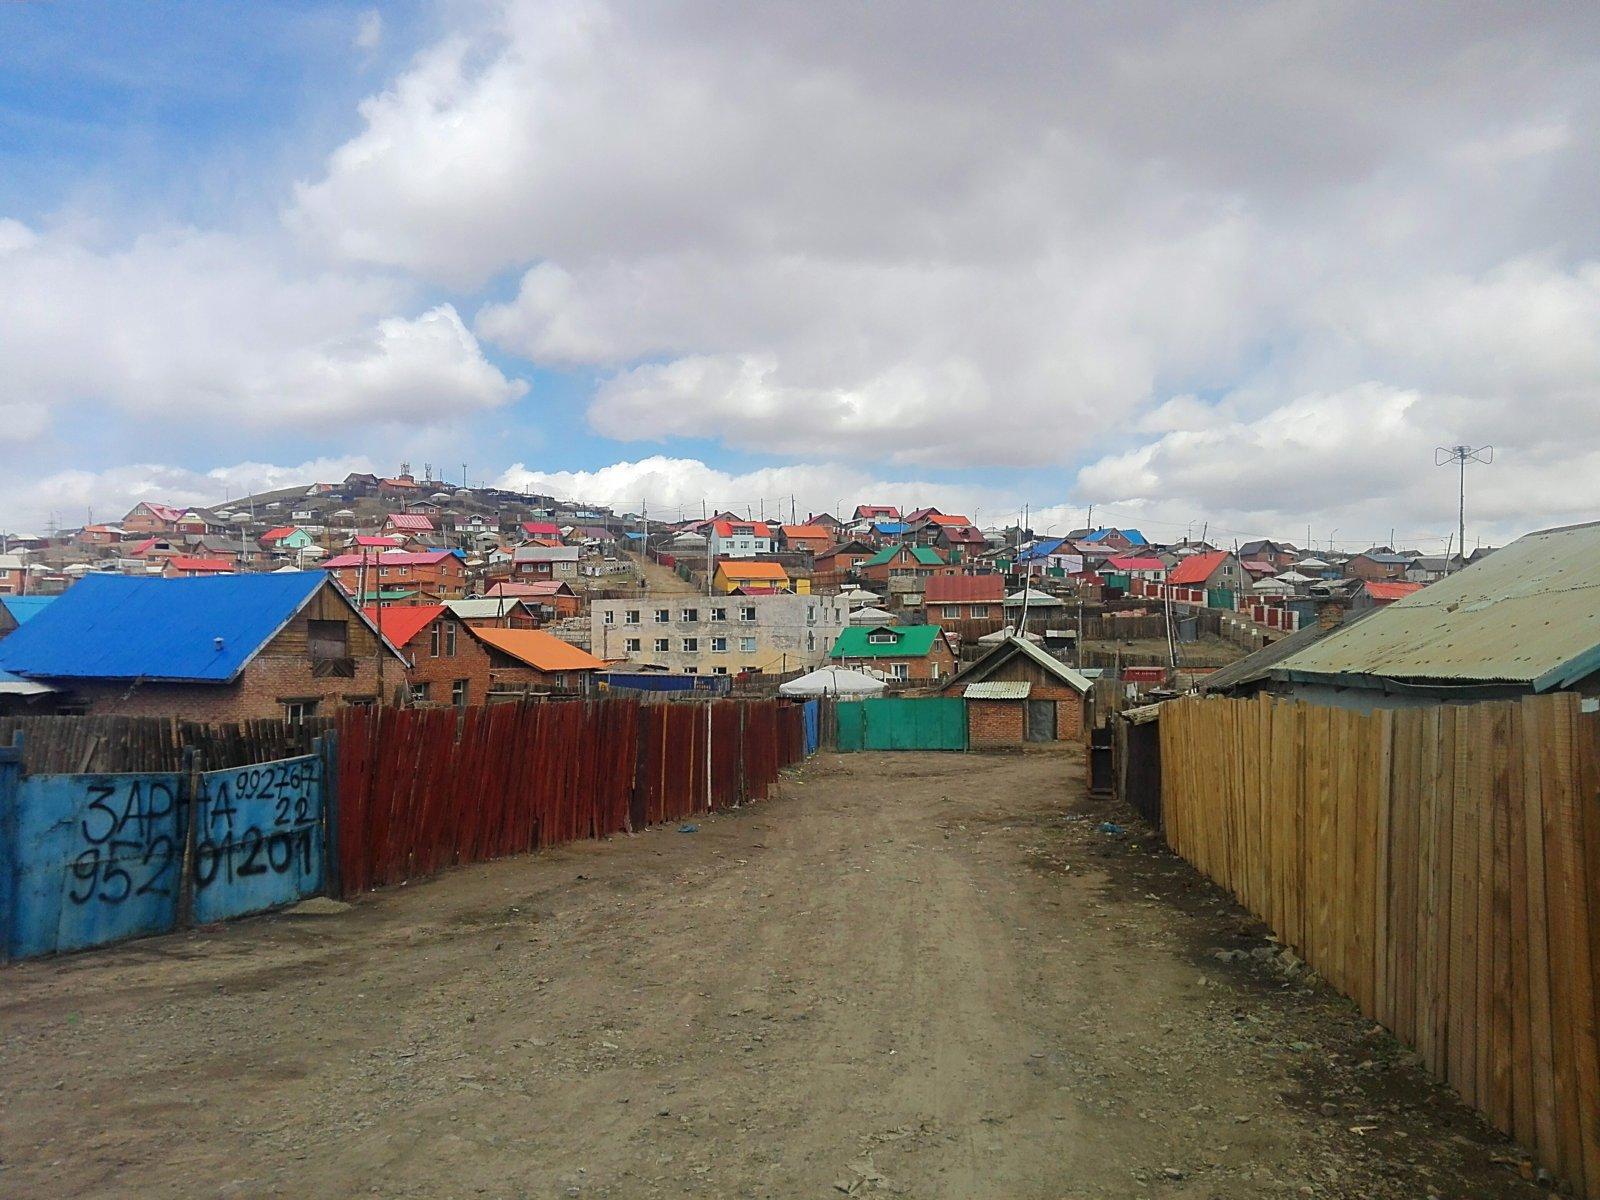 img_20160515_074411-jpg.30616_Mongolia Rainbow Horse Caravan_Travel Stories_Squat the Planet_2:55 AM